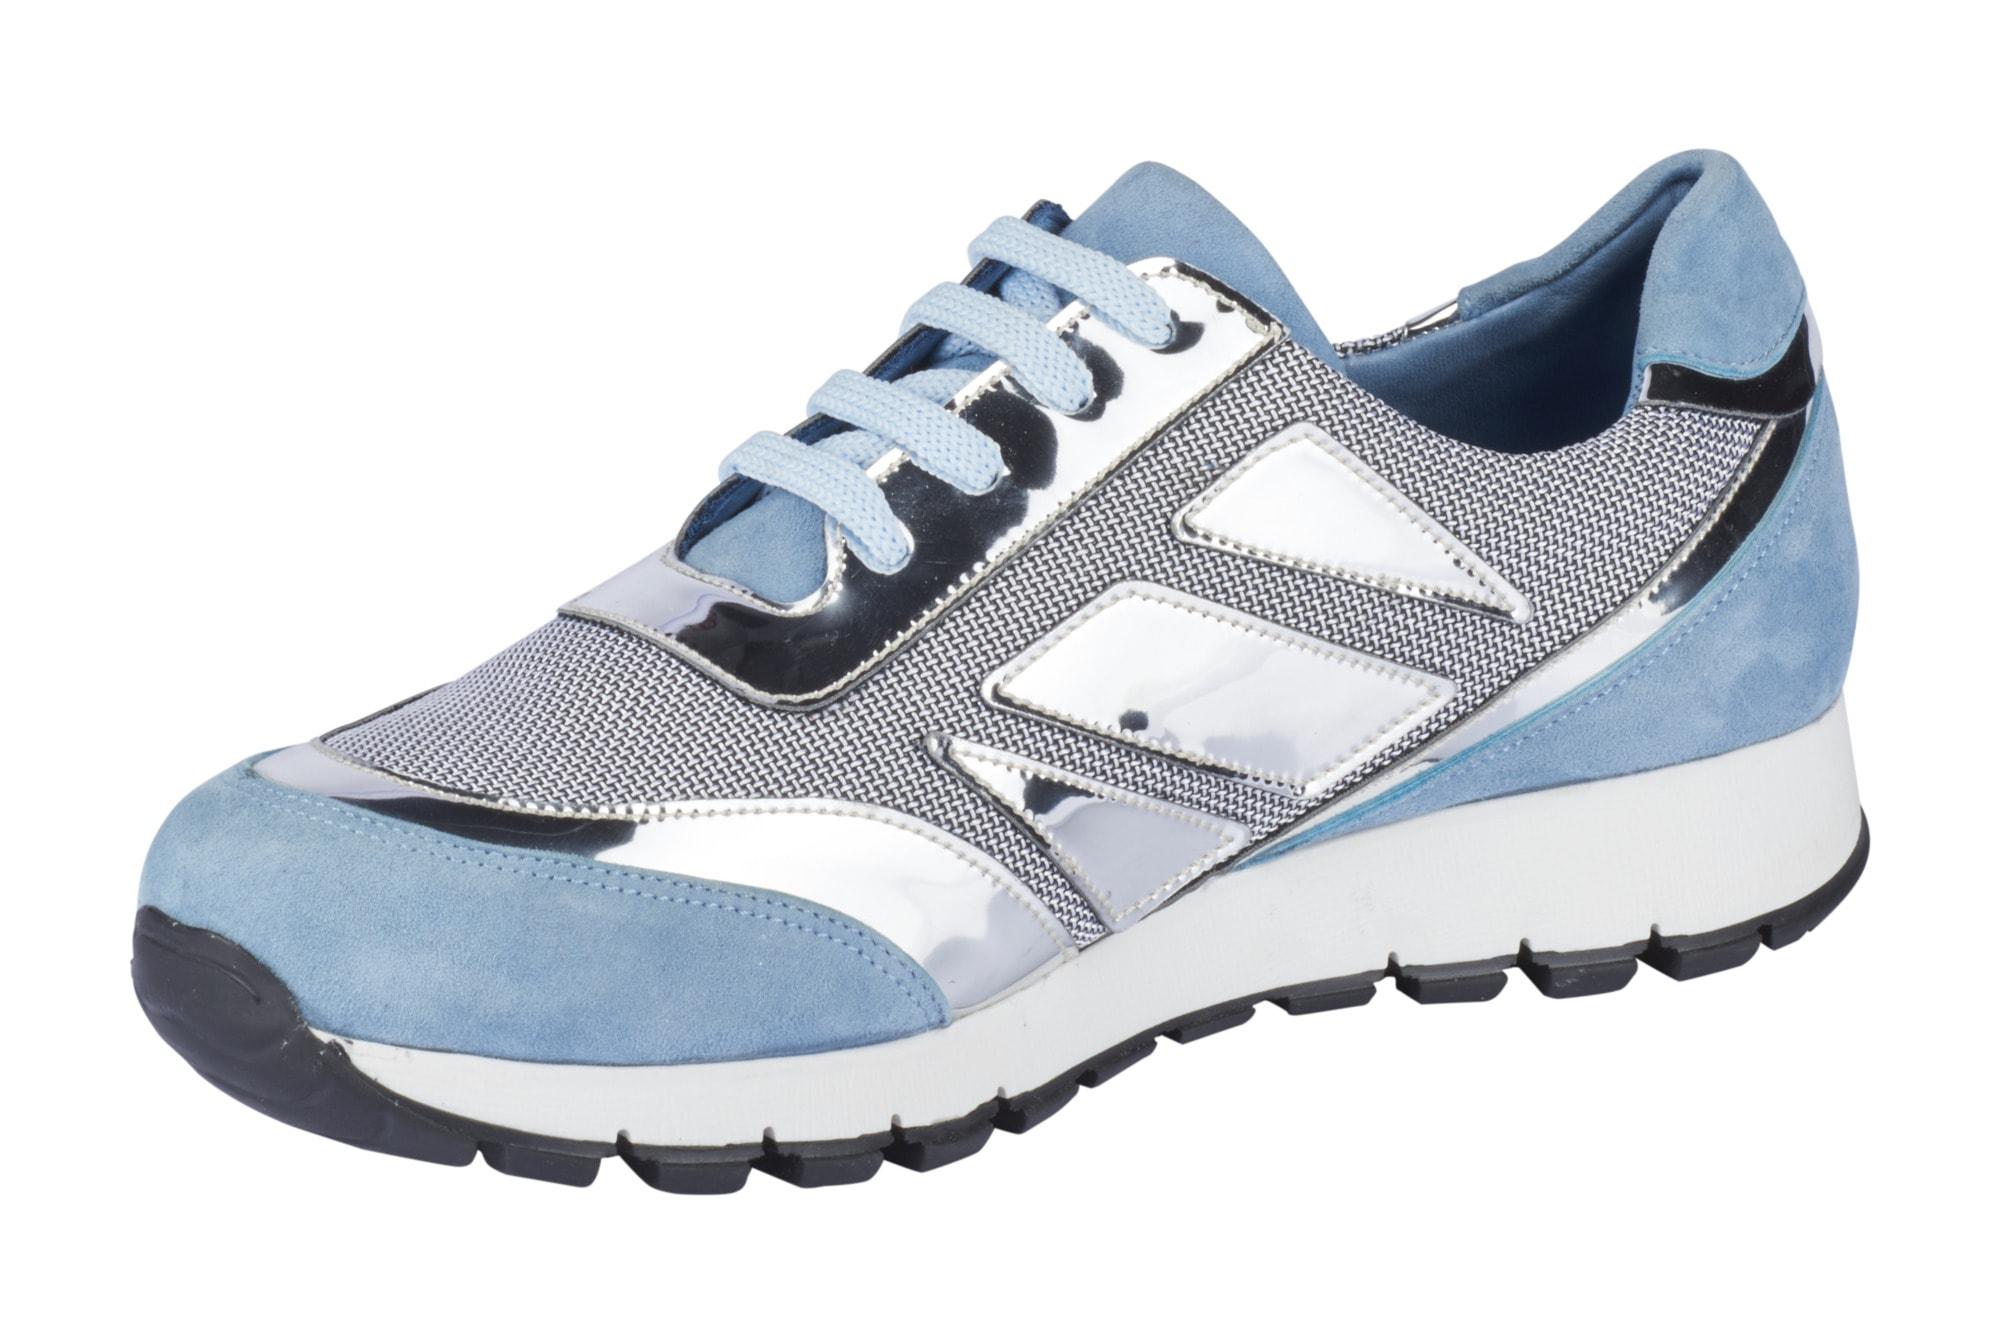 separation shoes 53e6b f4b68 imwalking SALE | Andrea Conti Sneaker im Metalliclook | 04054106408396